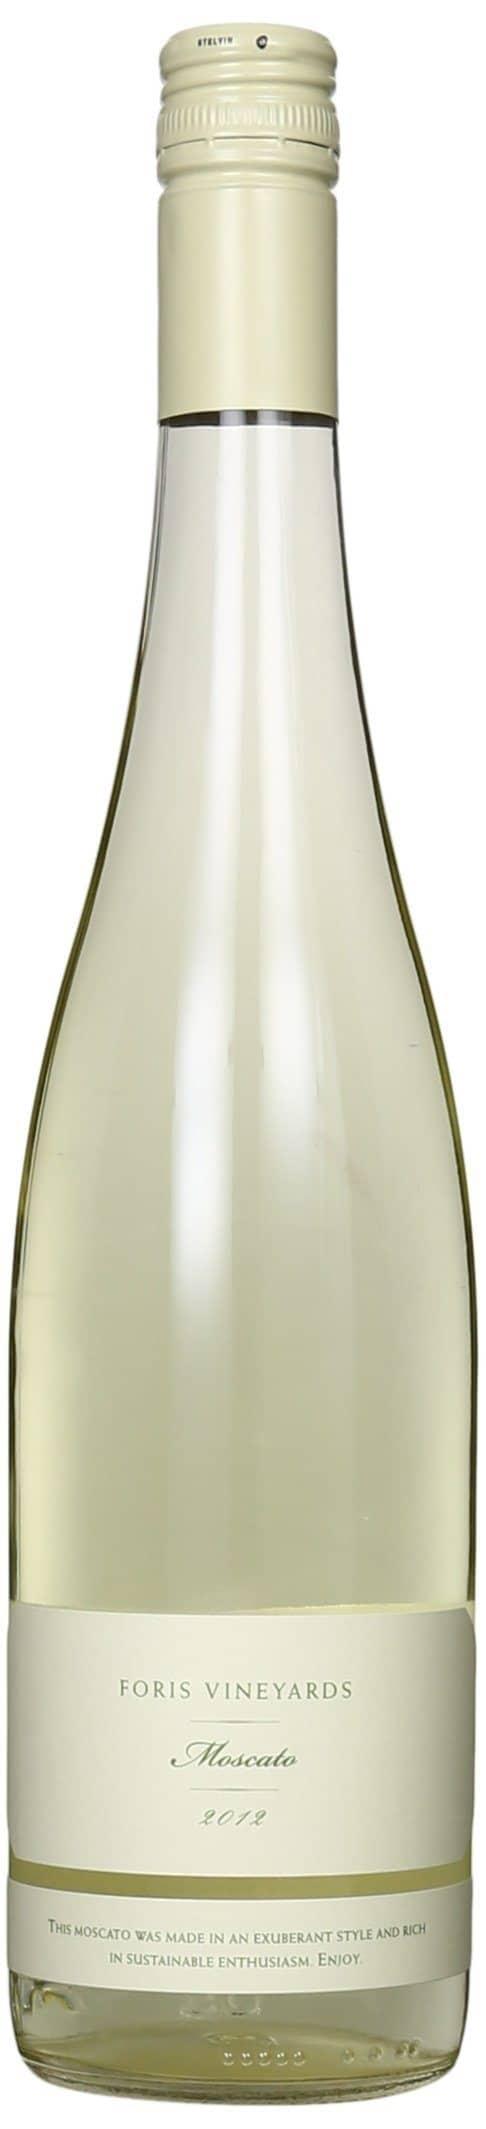 2015 Foris Vineyards Moscato Wine